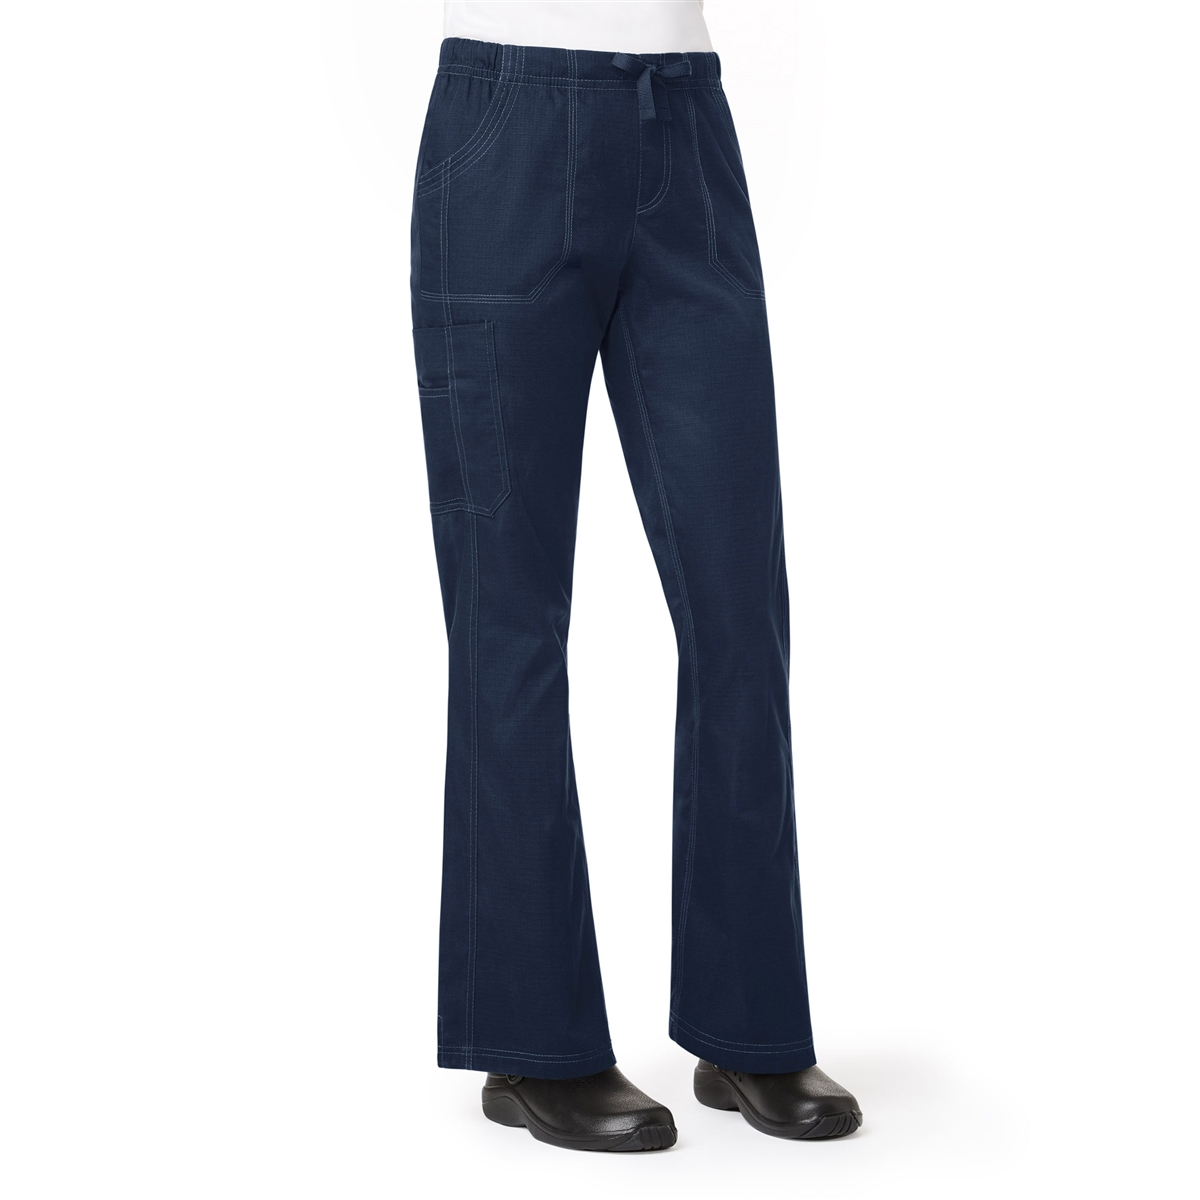 Wonderful Carhartt Cargo Pants  Carhartt W39 Grace Jogger Cargo Pants